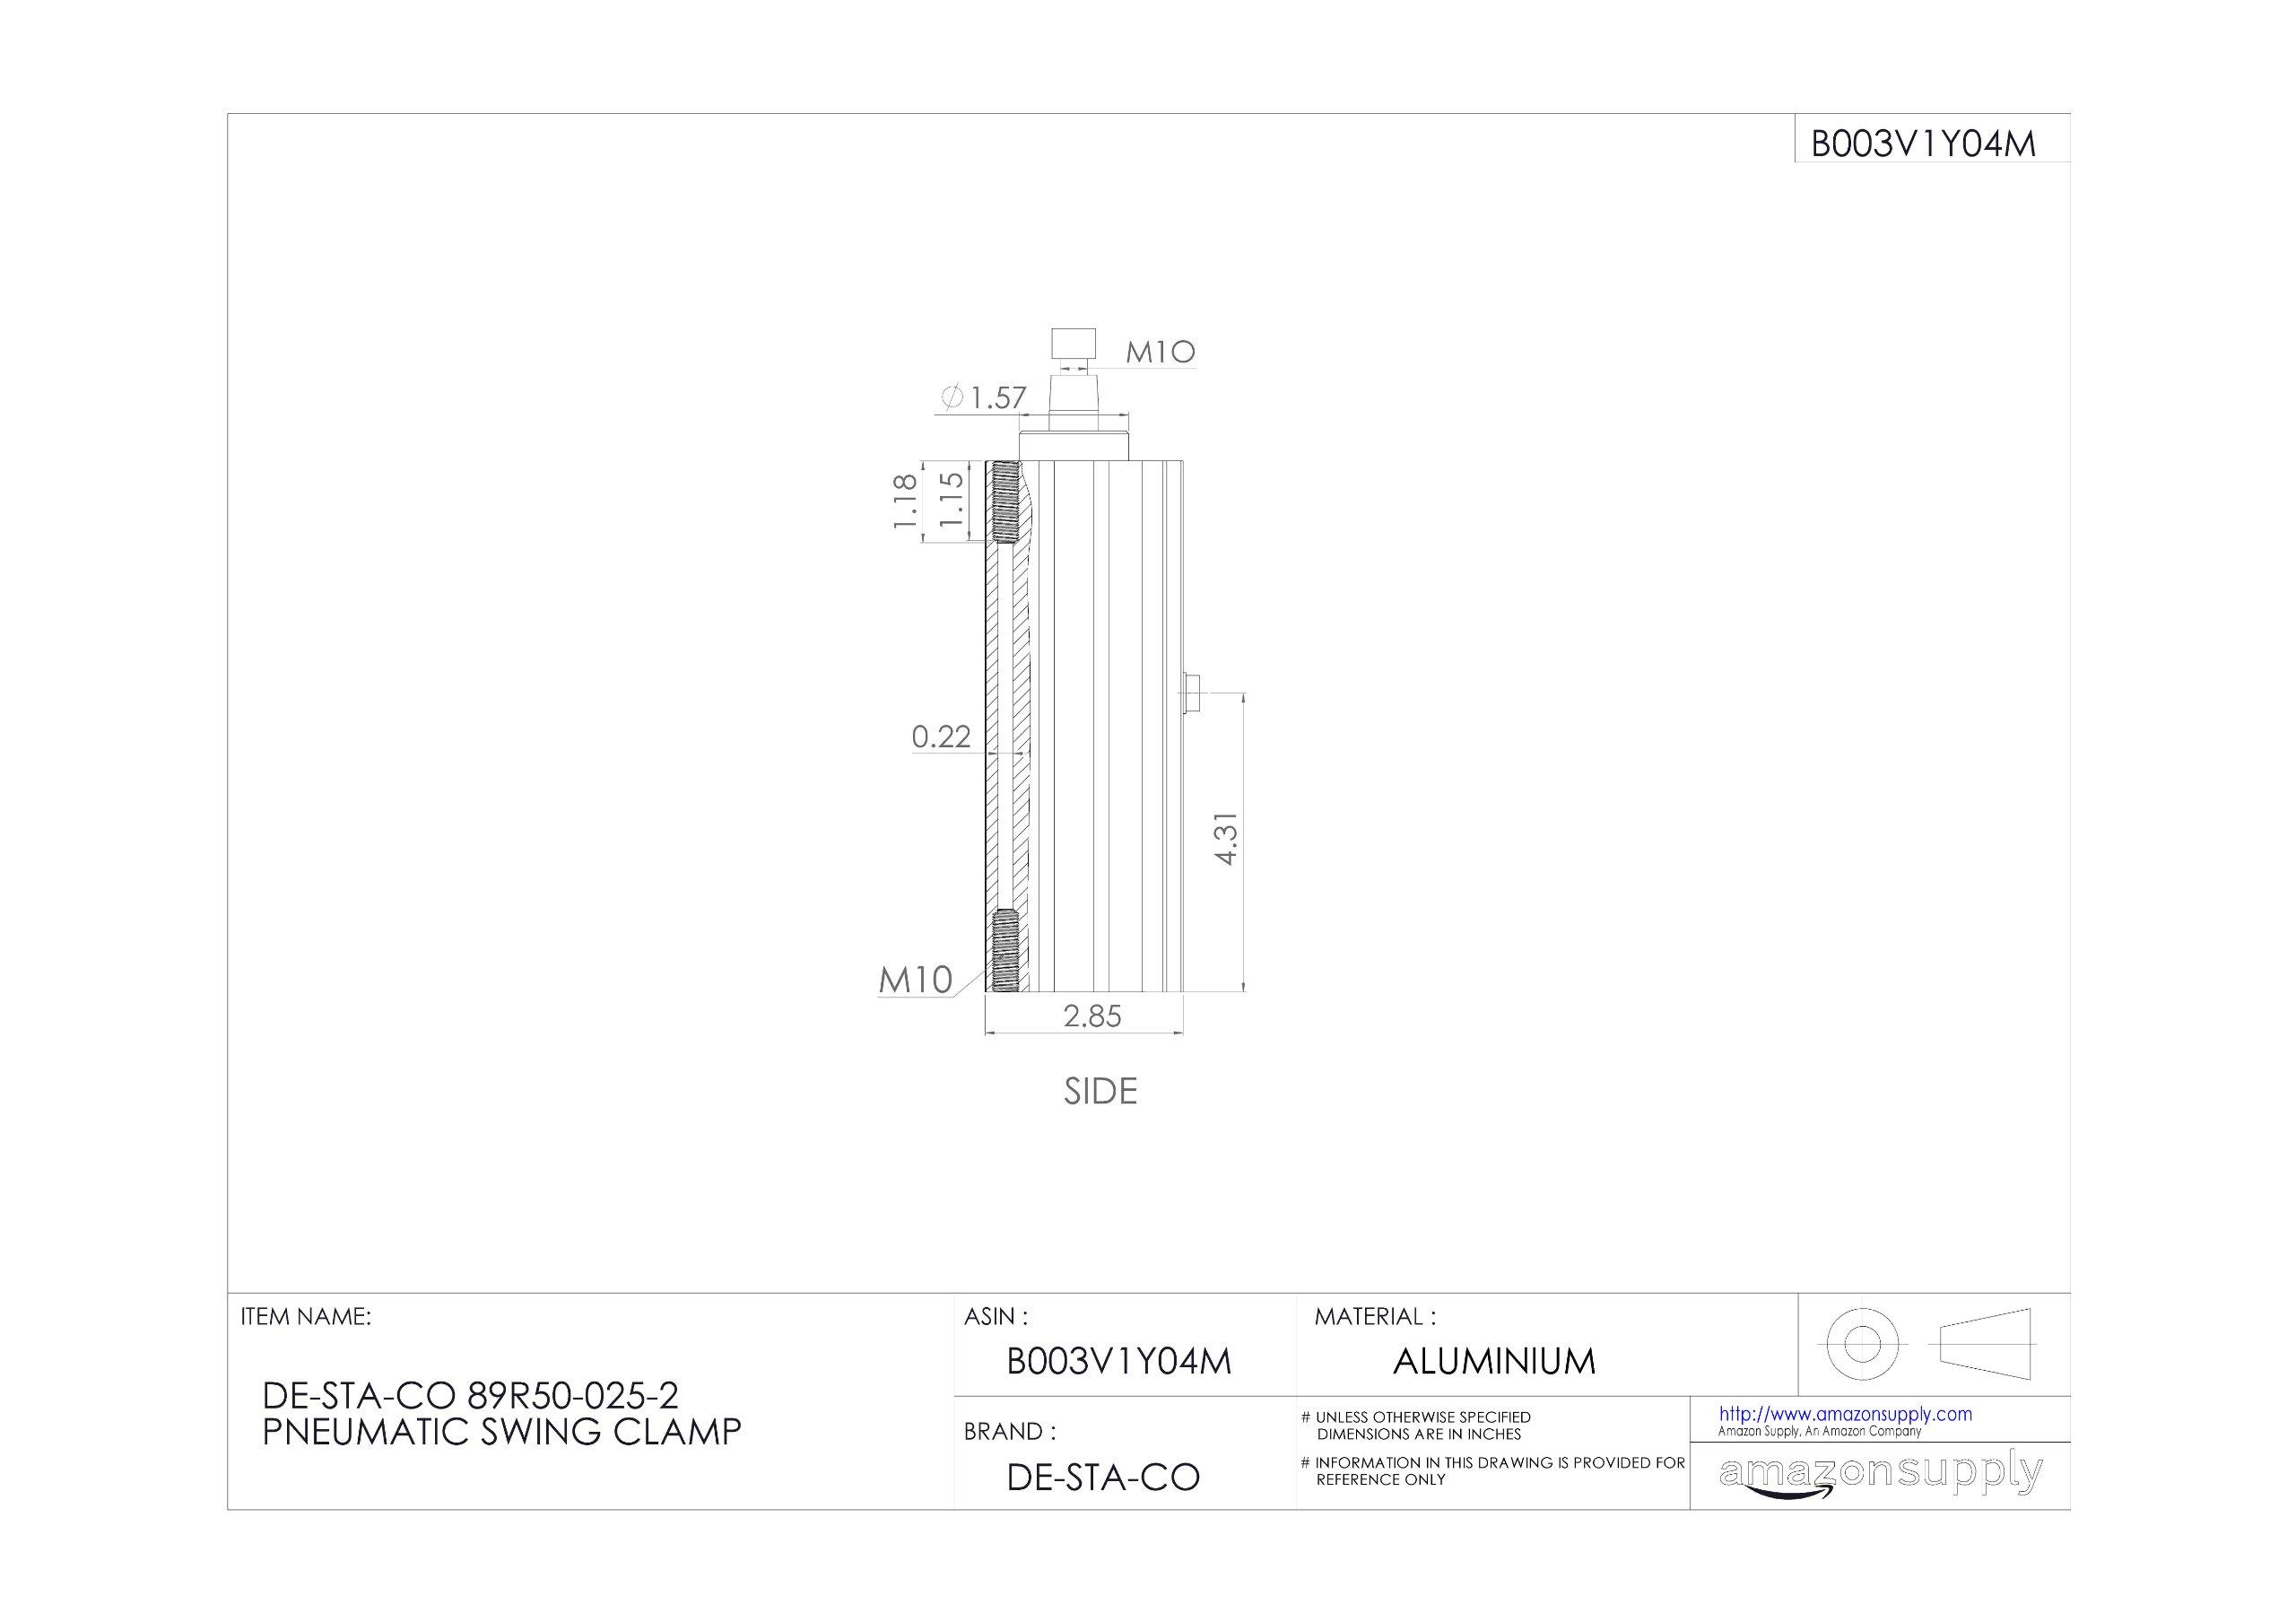 DE-STA-CO 89R50-025-2 Pneumatic Swing Clamp by De-Sta-Co (Image #3)